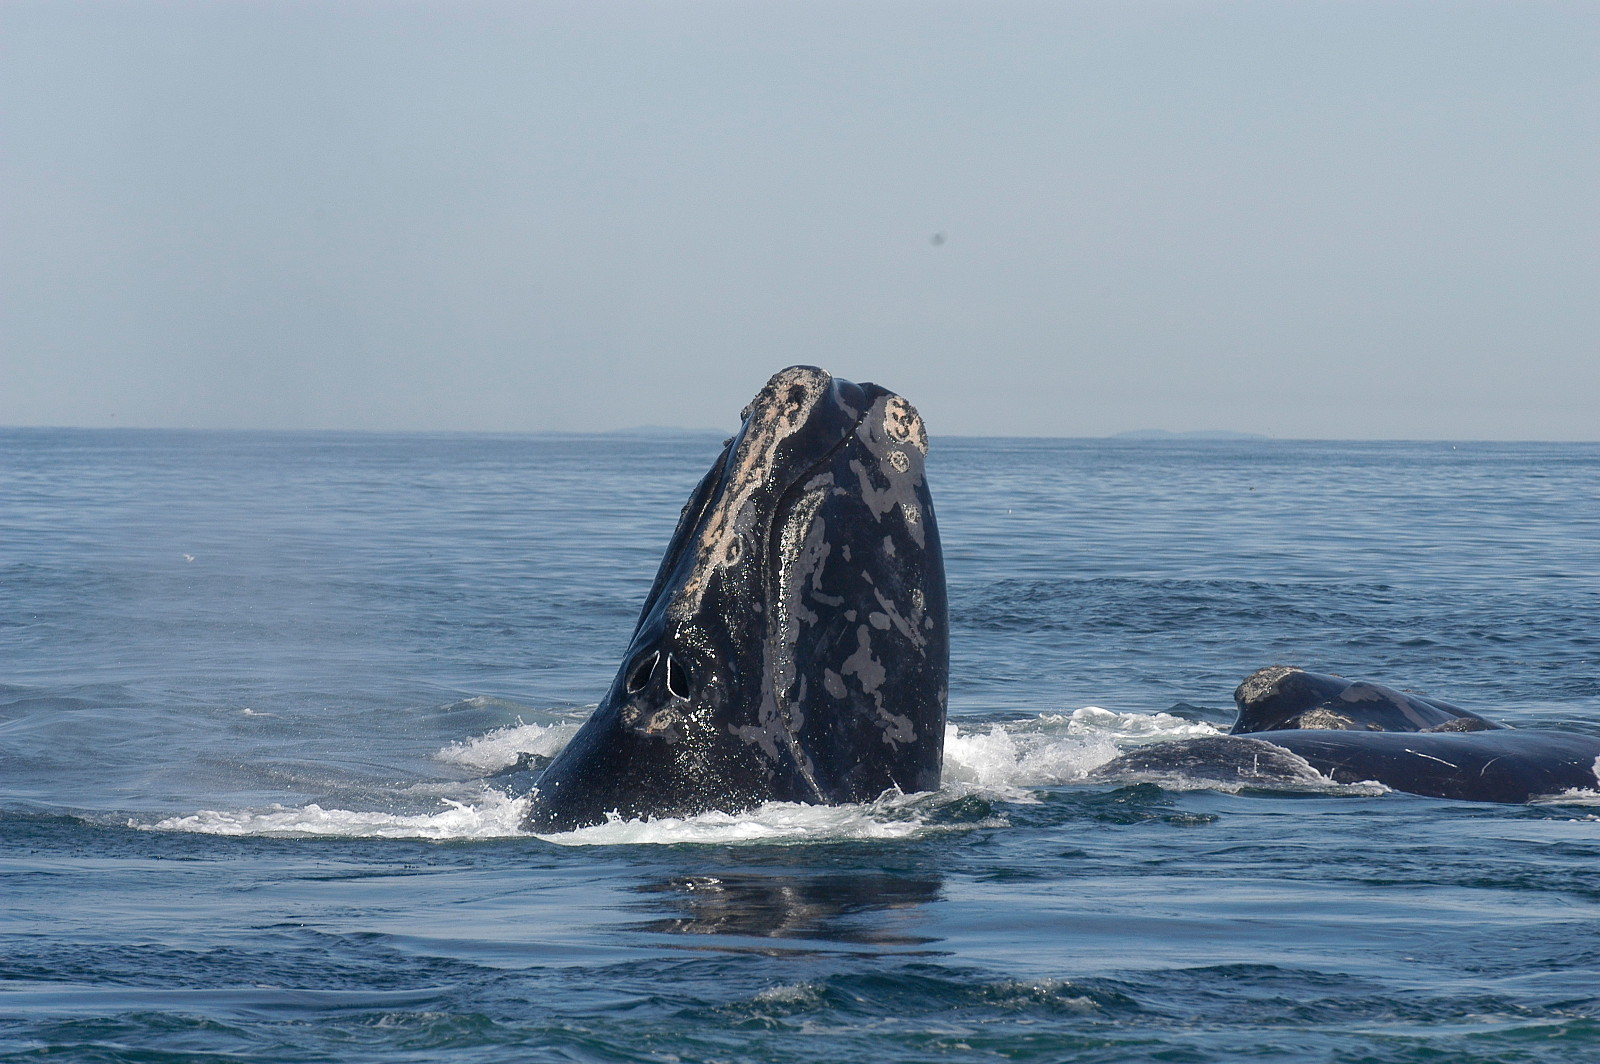 Regina Easterly: Ocean Planning or Pandering–Obama Administration OK's Seismic Testing Along U.S. East Coast